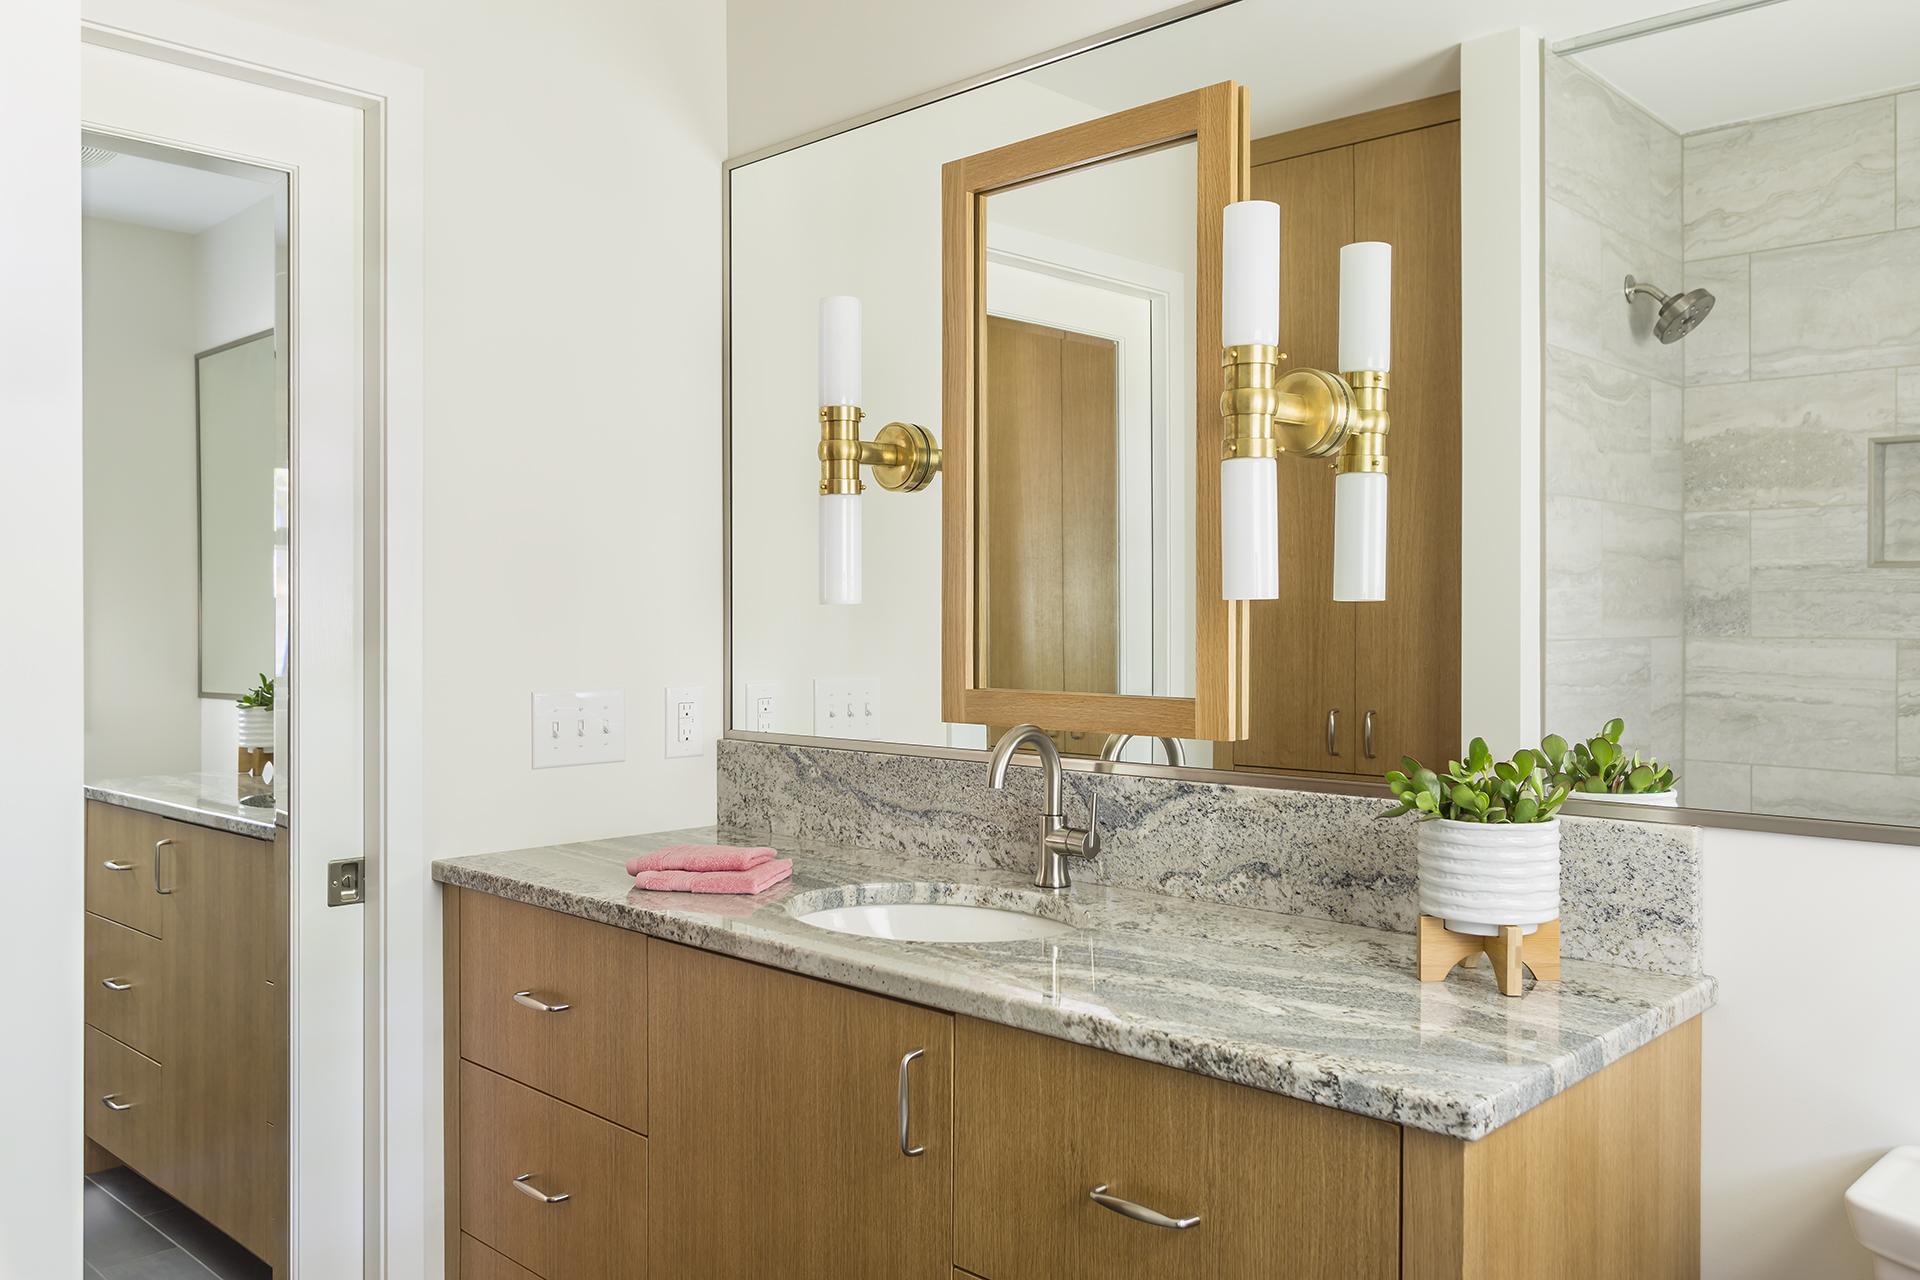 Bathroom2_2019_06_03.jpg